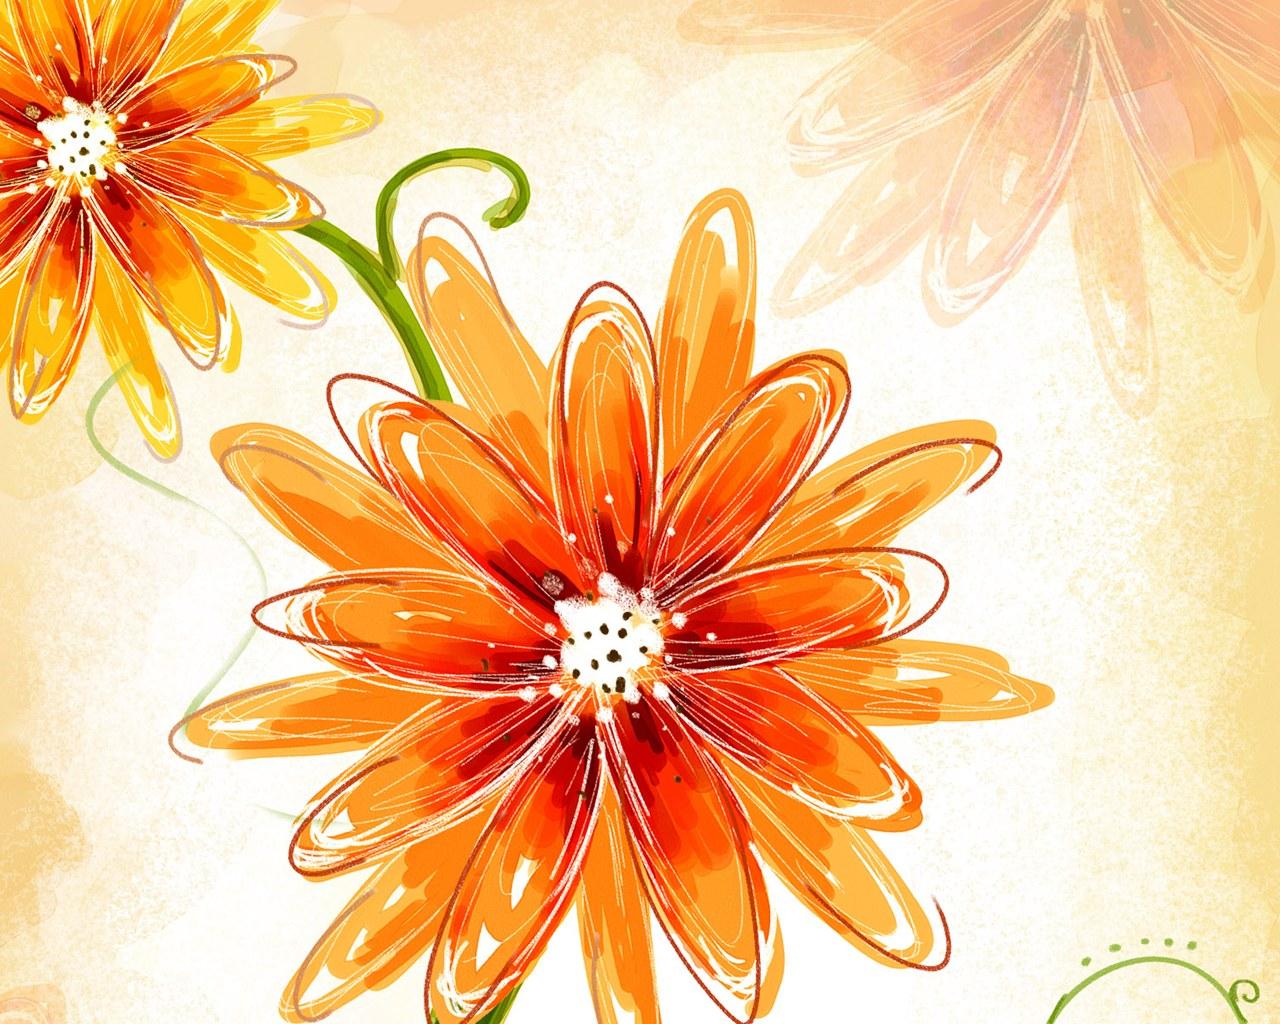 flower designs painting imazes flowers